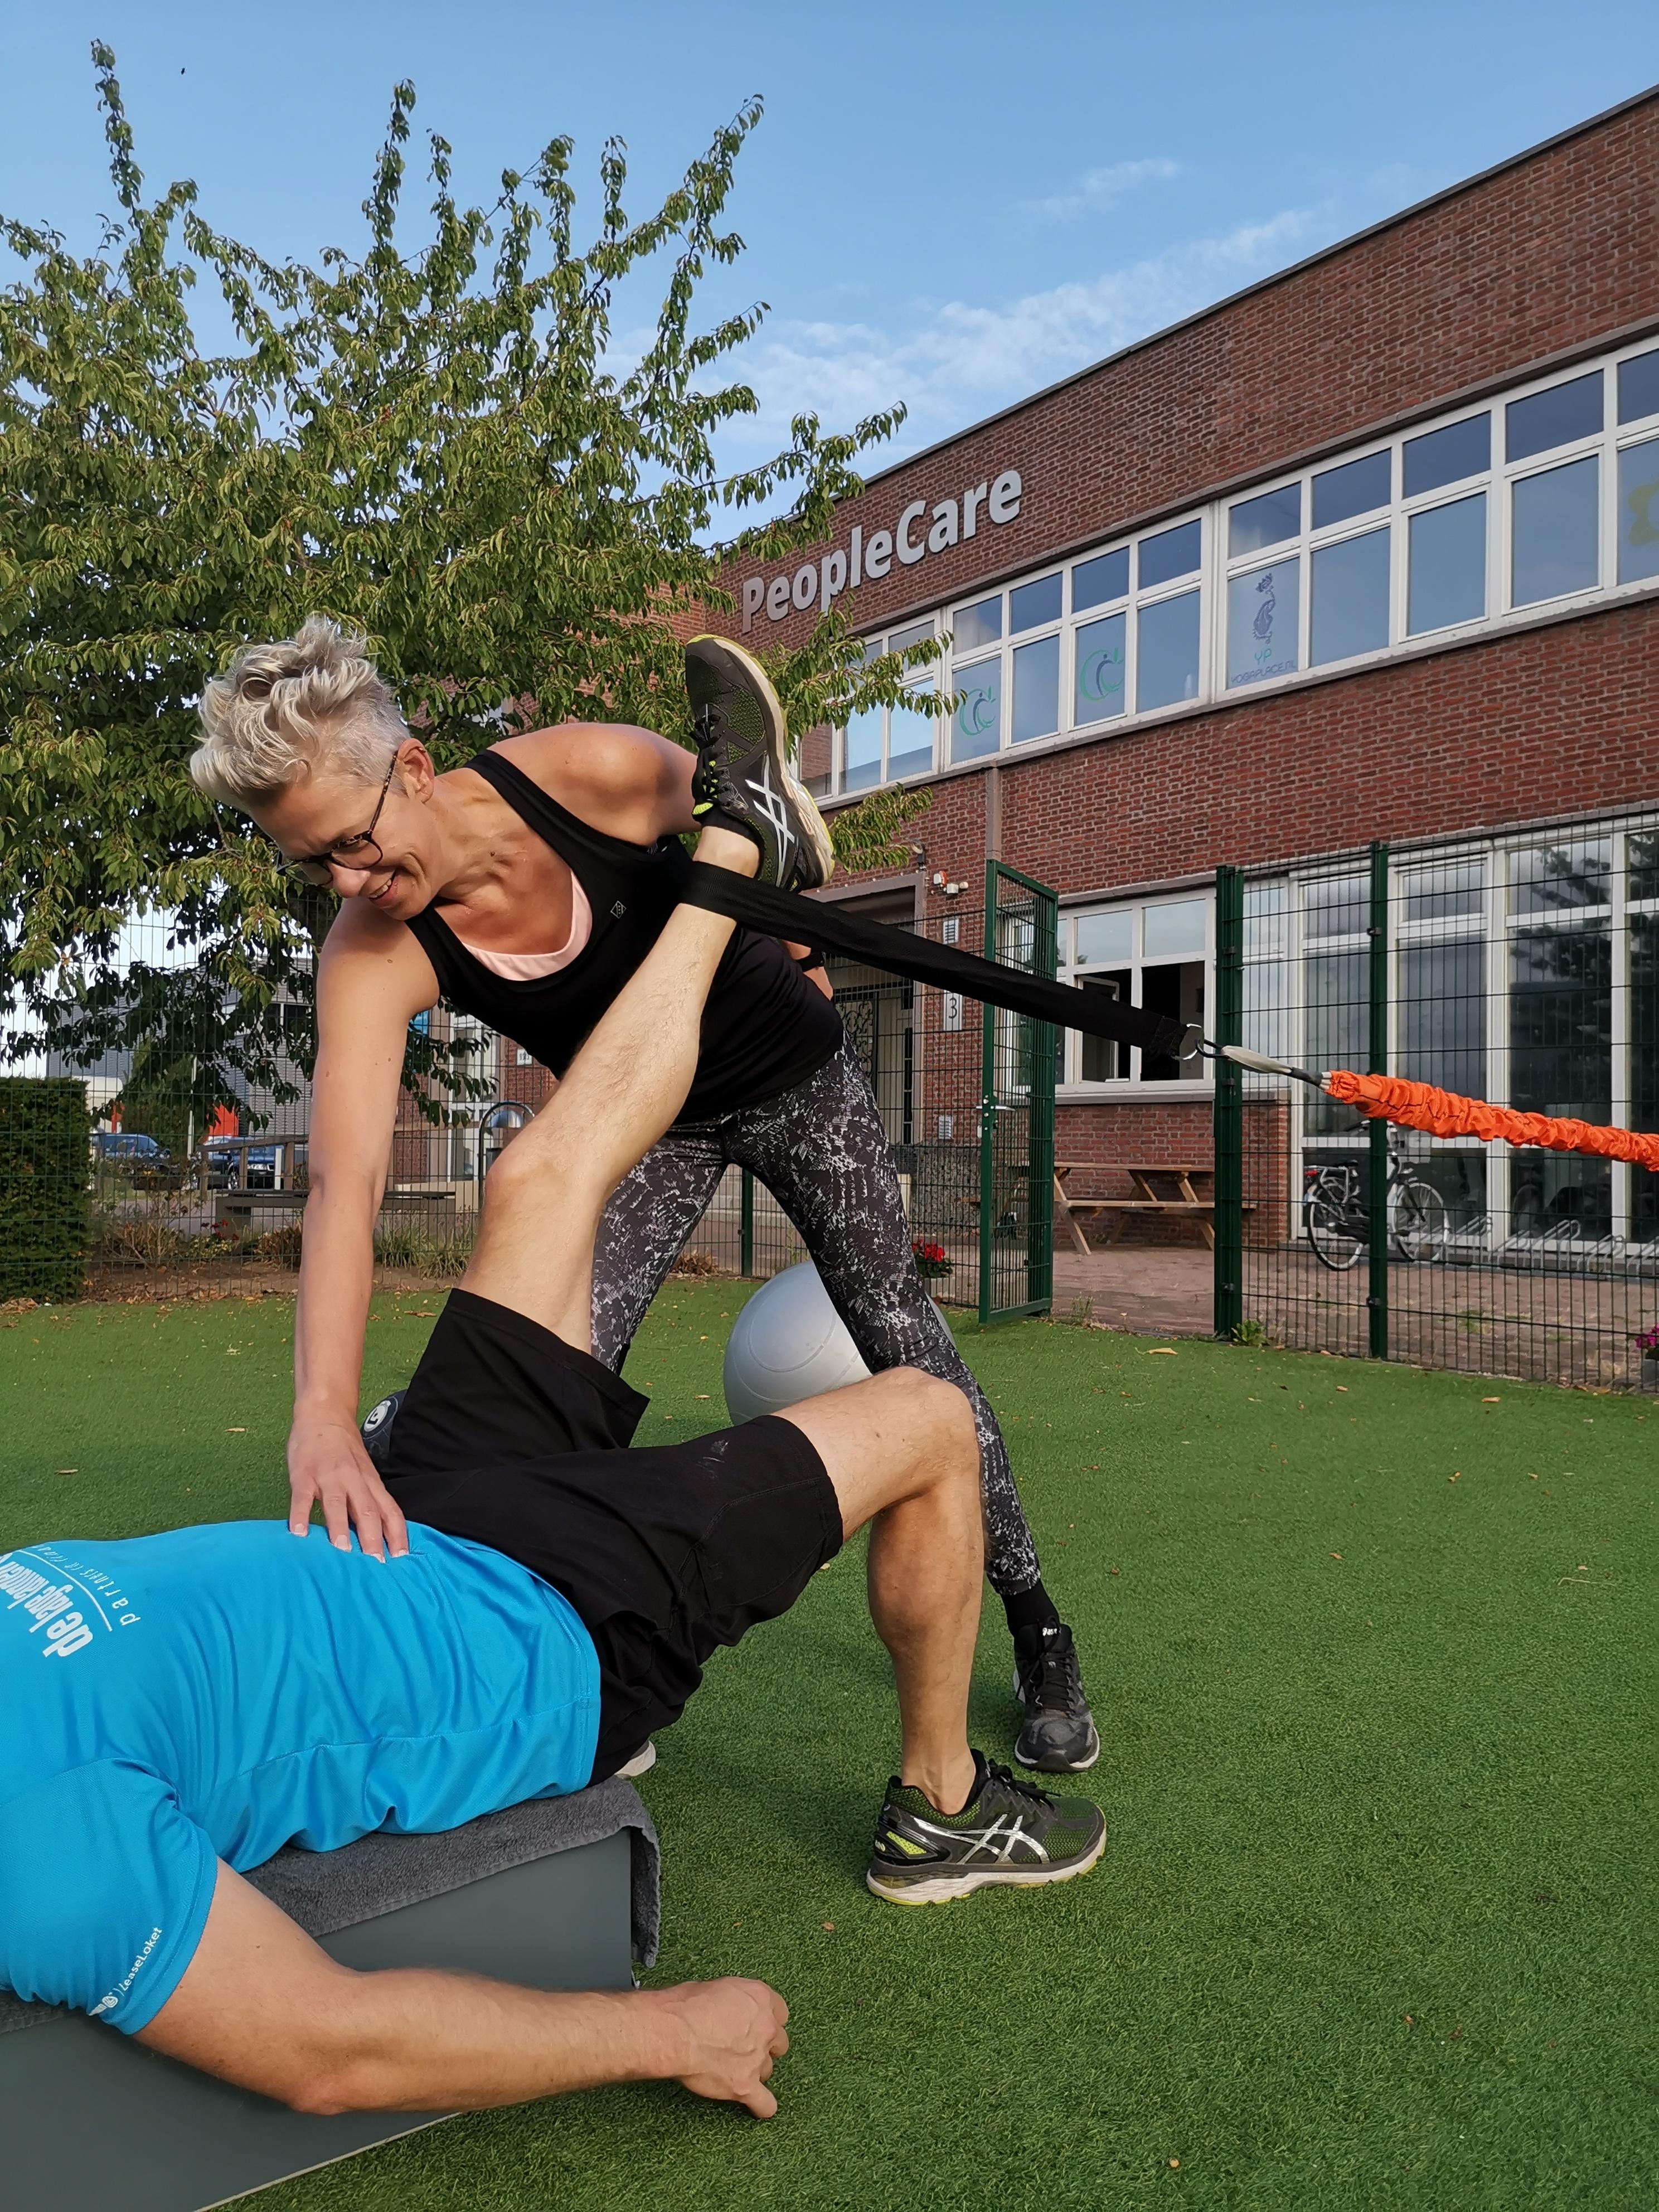 Personal Coaching Roermond